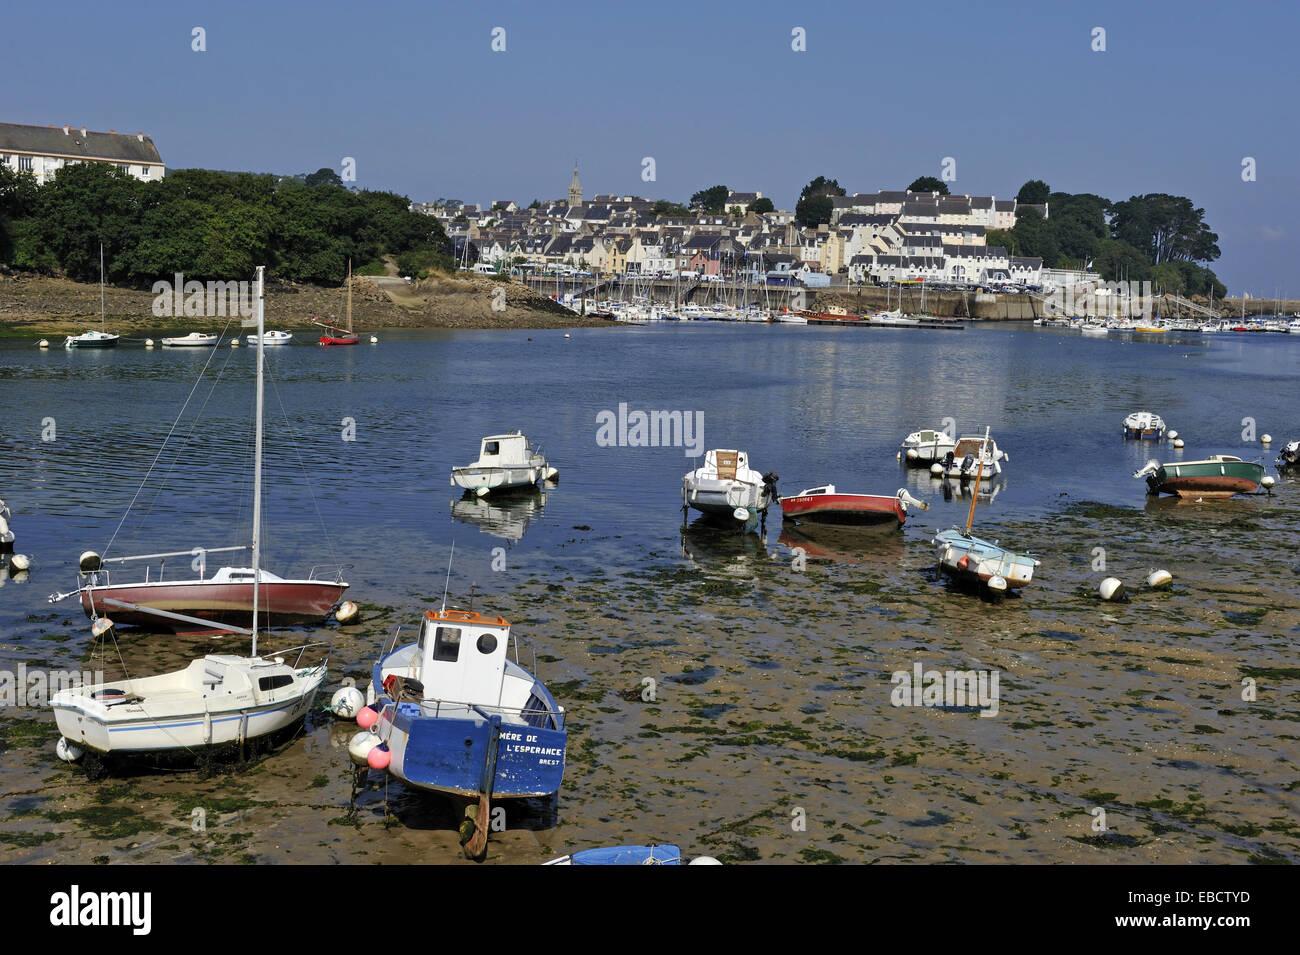 Entlang der Atlantikküste Hintergründe Bay Boot Bretagne Küste Farbe Bild Cornouaille Abteilung Douarnenez Stockbild